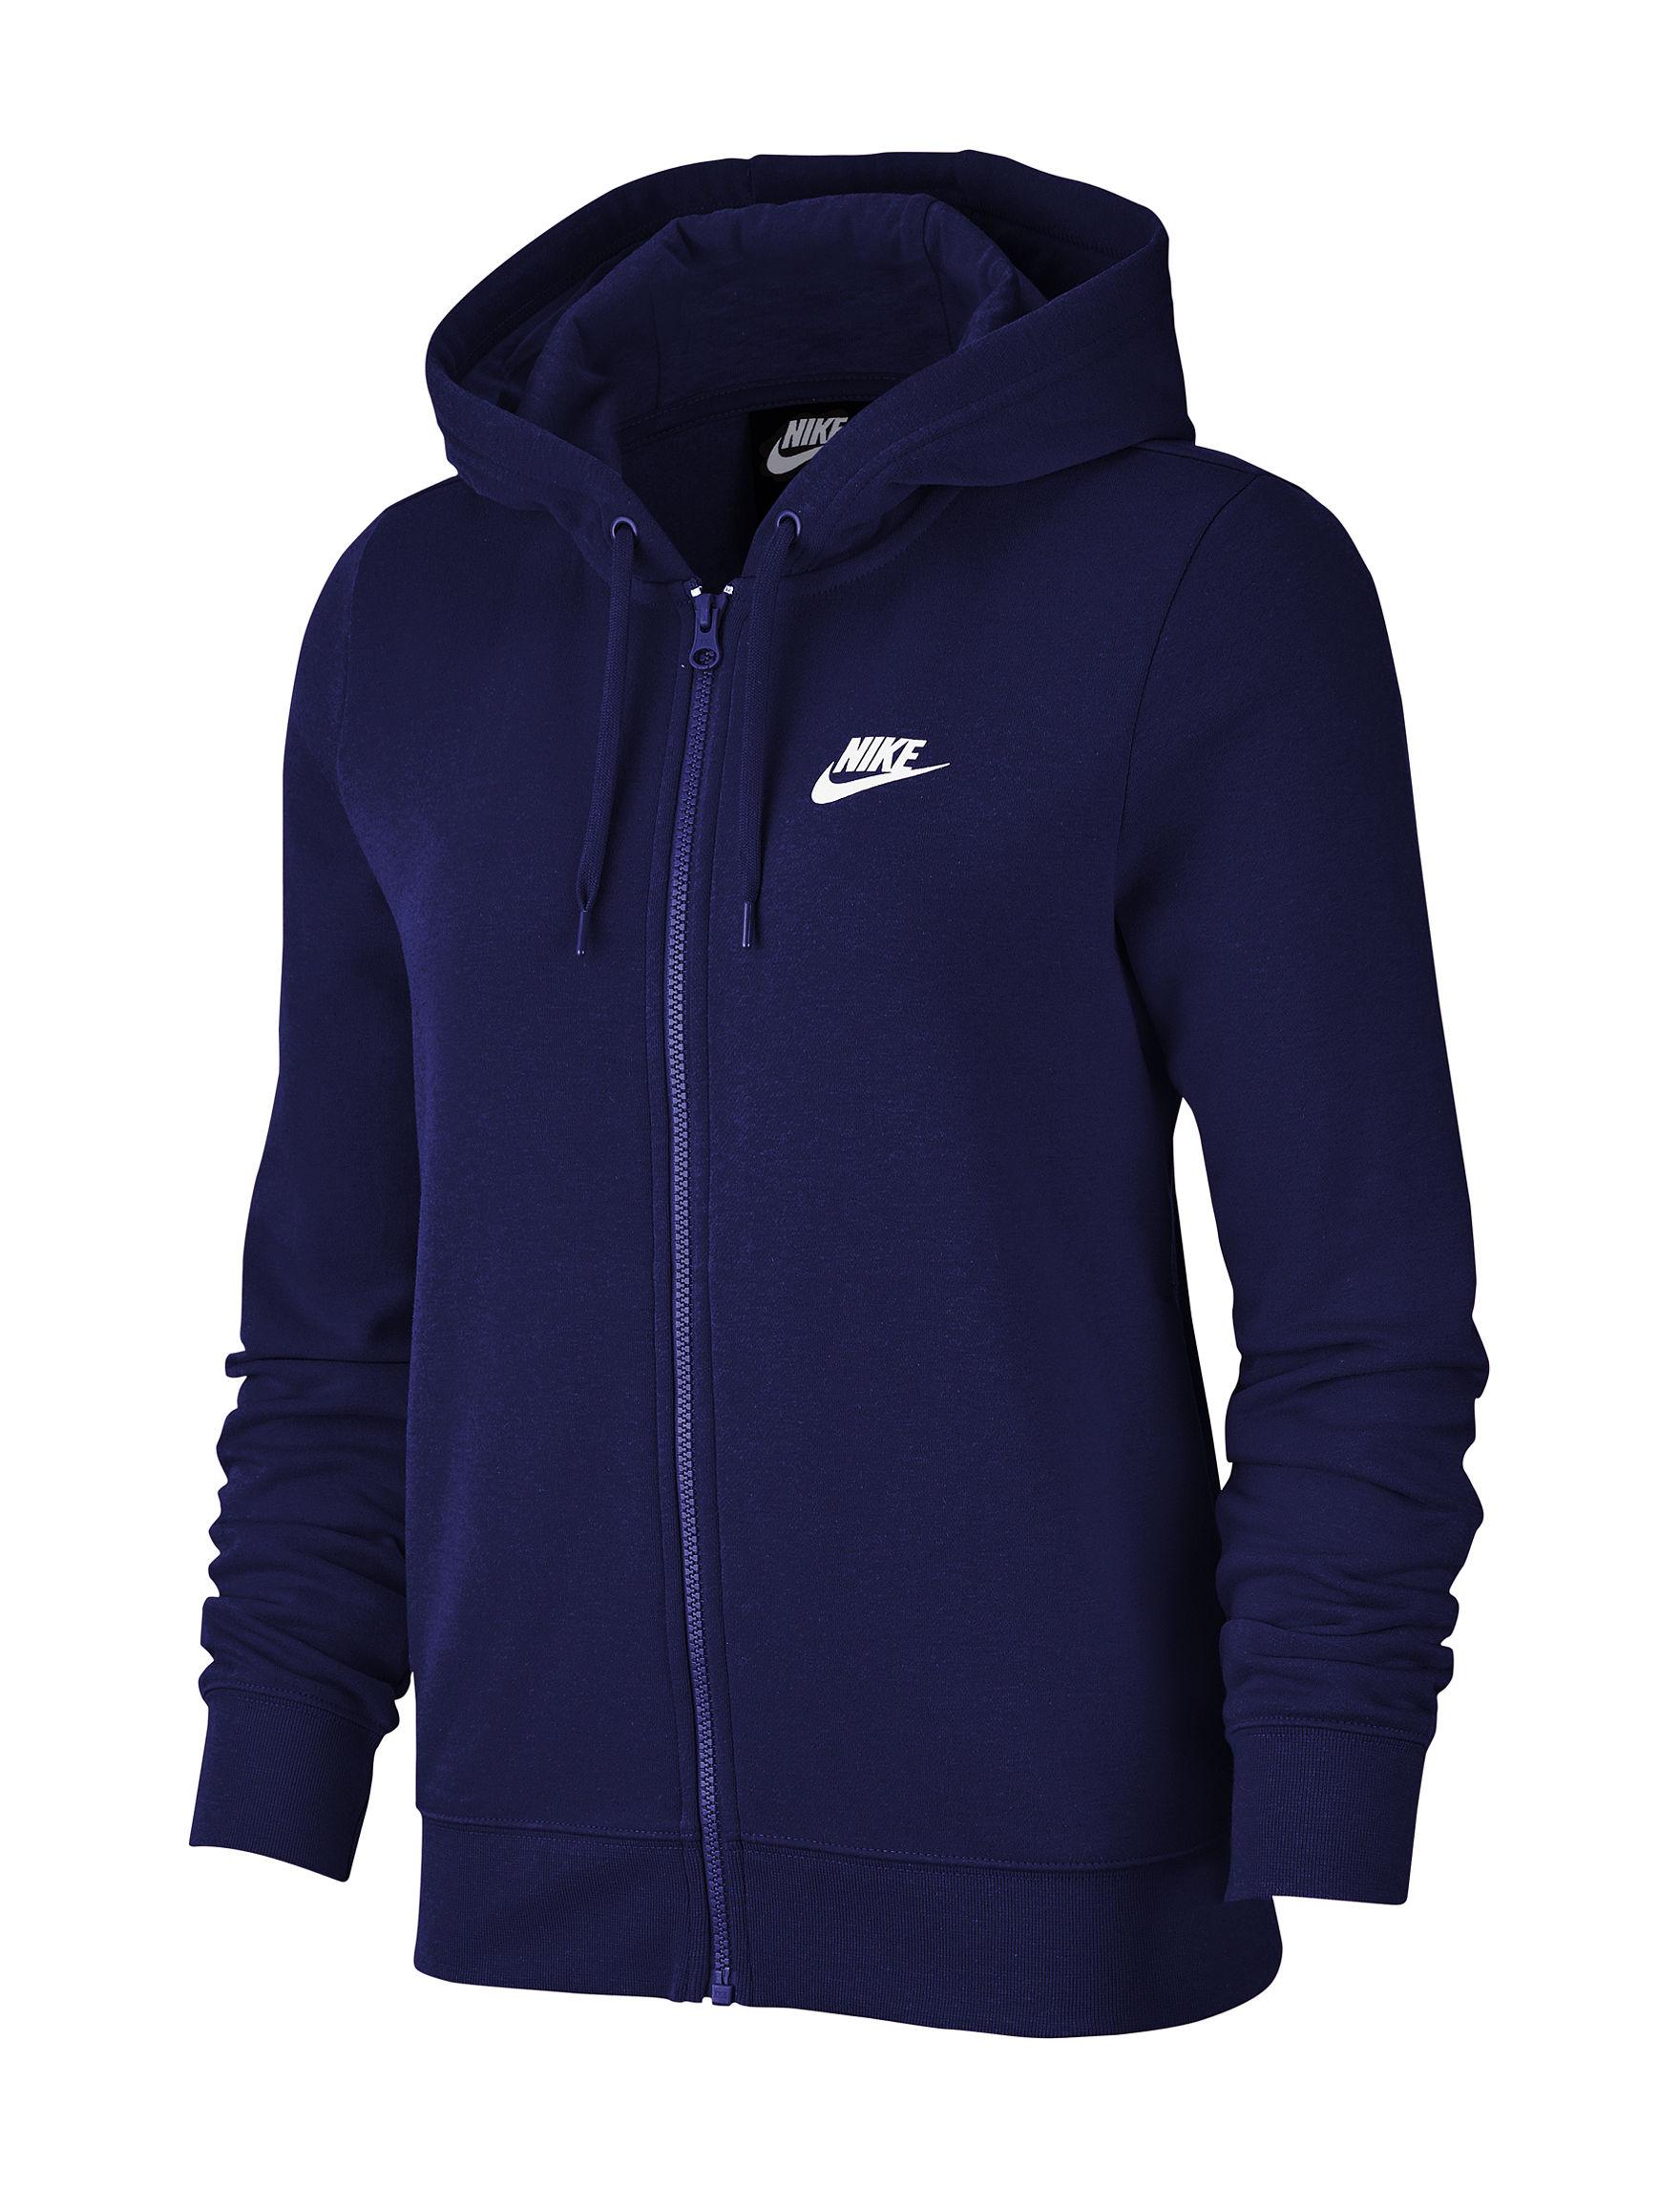 Nike Navy Active